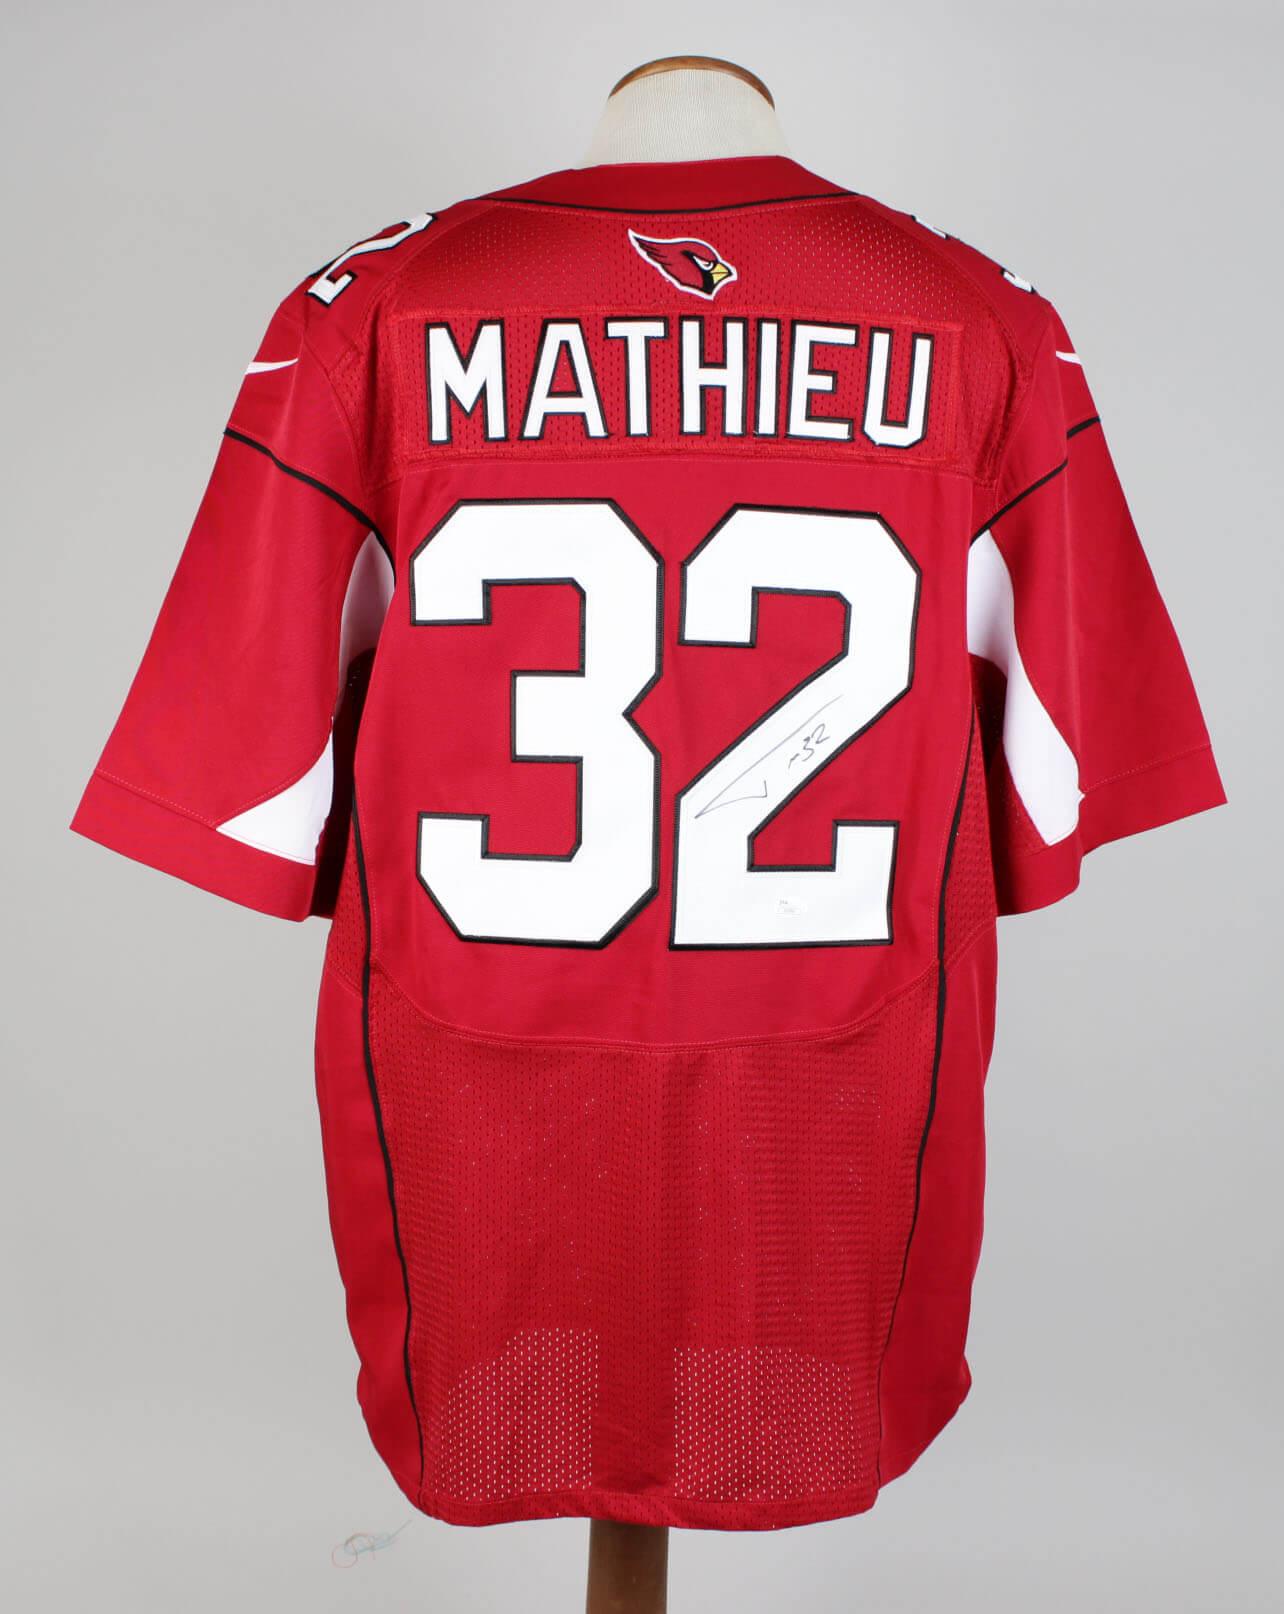 64c422cbd ... cheap NFL Jerseys Online - Tyrann Mathieu (Honey Badger) Arizona  Cardinals Signed   Inscribed .